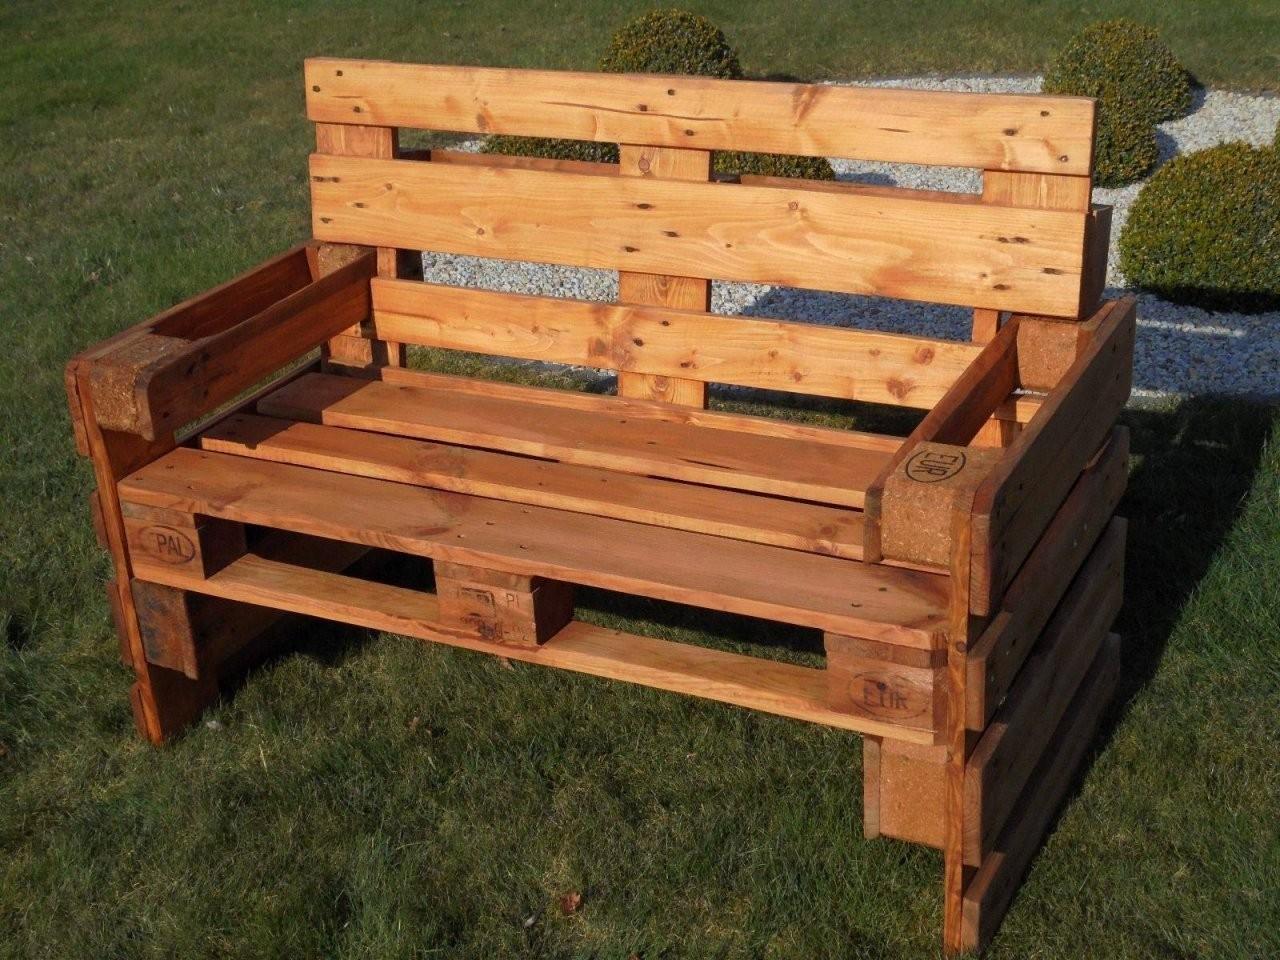 Gartenbank Holz Selber Bauen Luxus Rustikale Holzbank Selber Bauen von Rustikale Holzbank Selber Bauen Bild